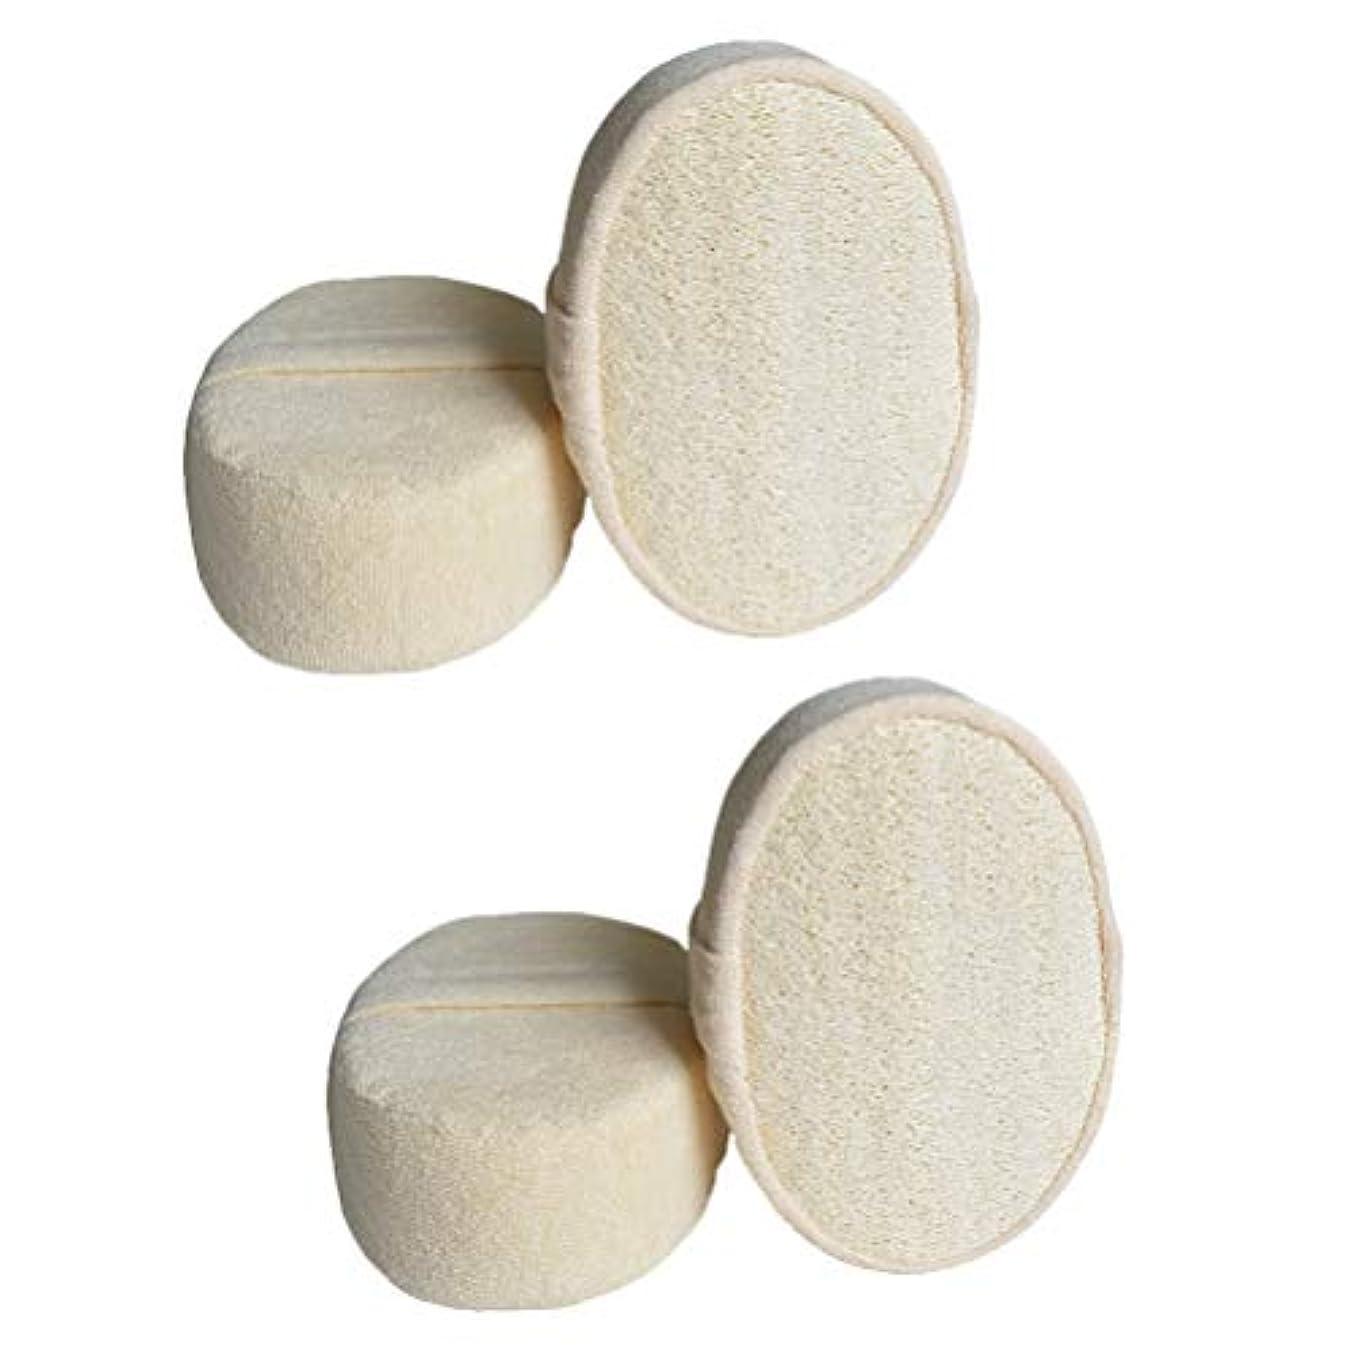 Healifty 4ピース剥離剥離剤パッドloofaスポンジスクラバーブラシ用風呂スパシャワー